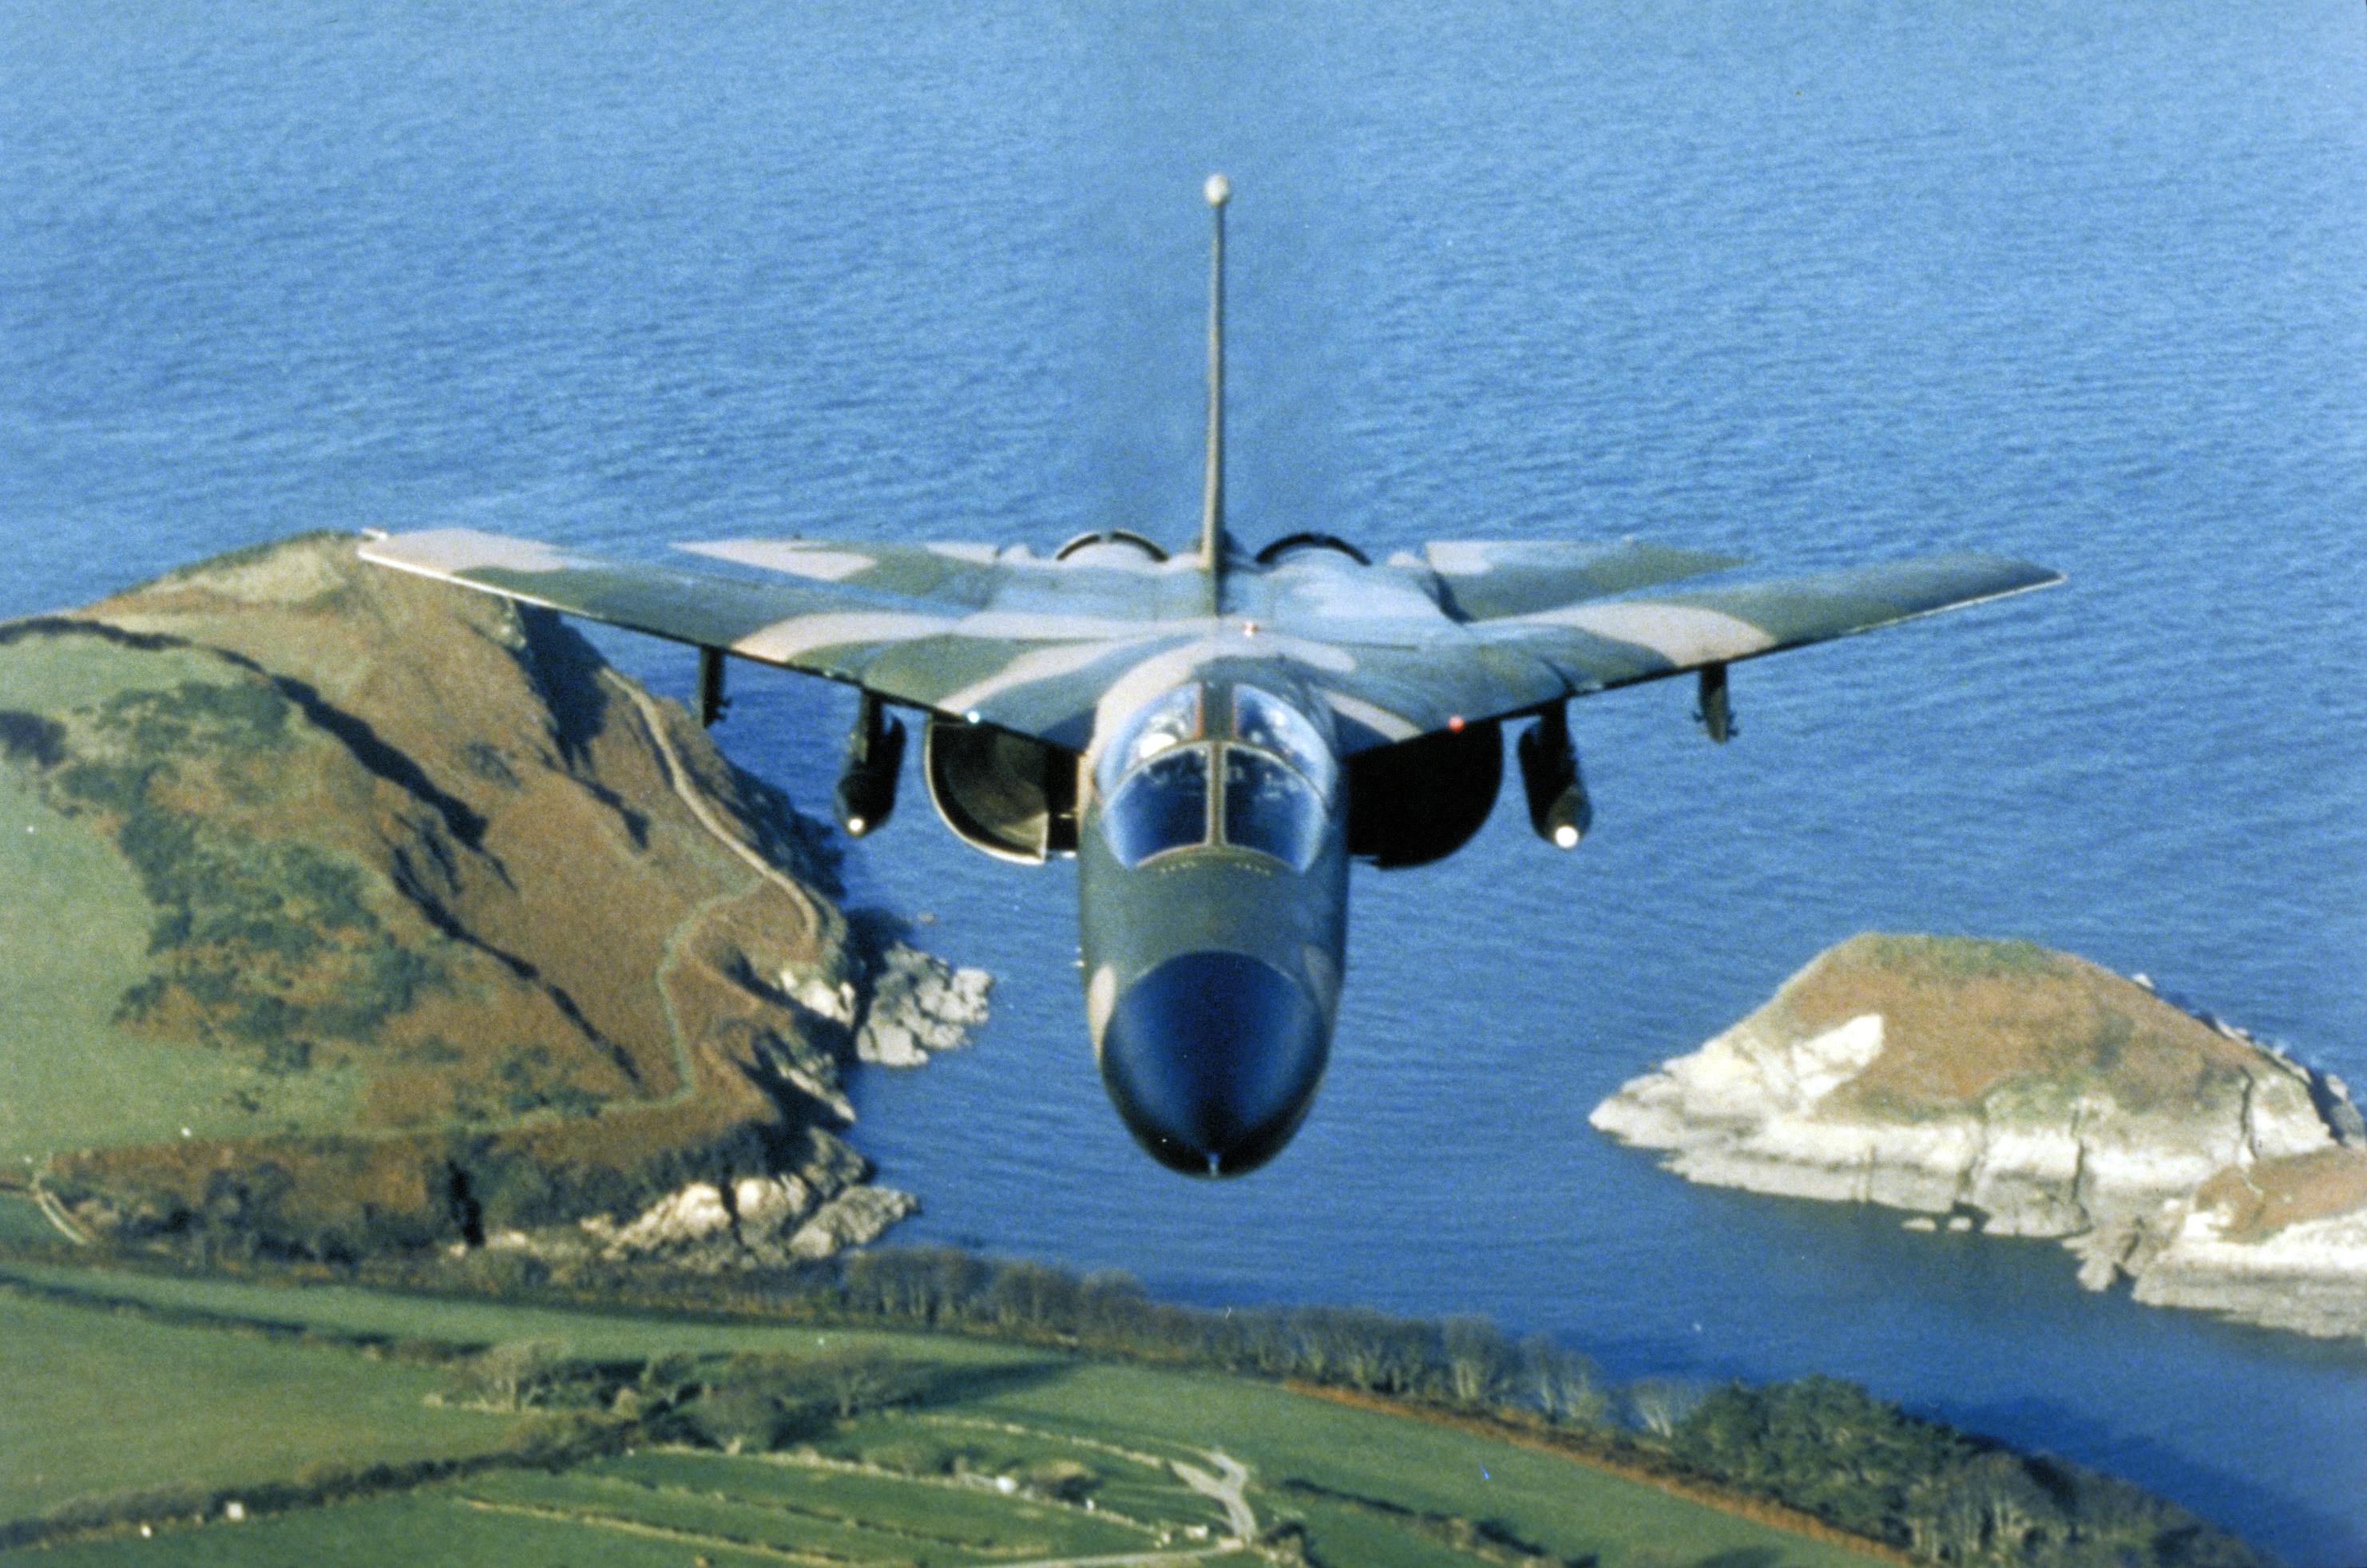 F 111 Lockheed Martin